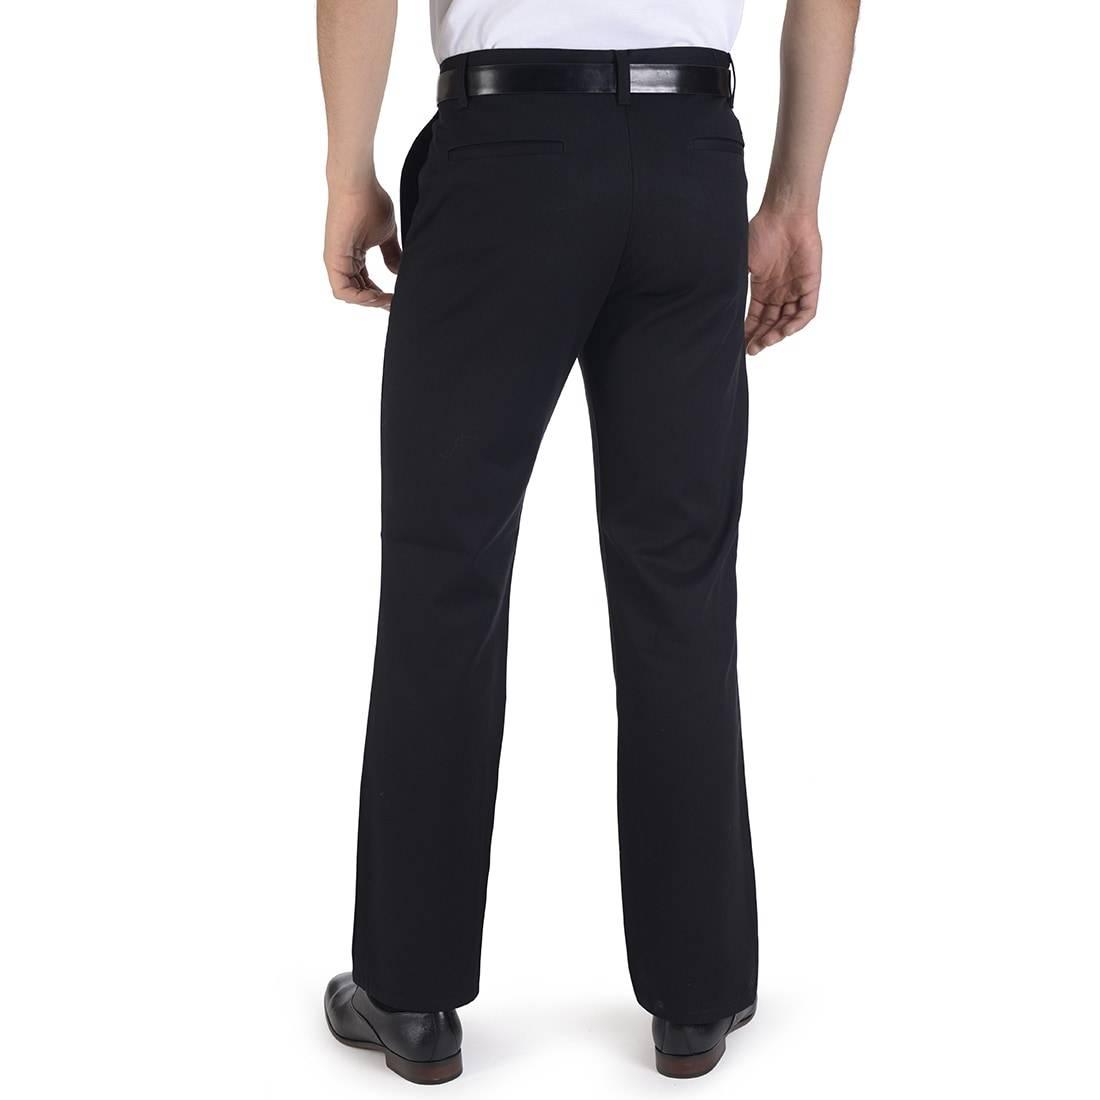 010789055209-02-Pantalon-Casual-Classic-Fit-Negro-yale